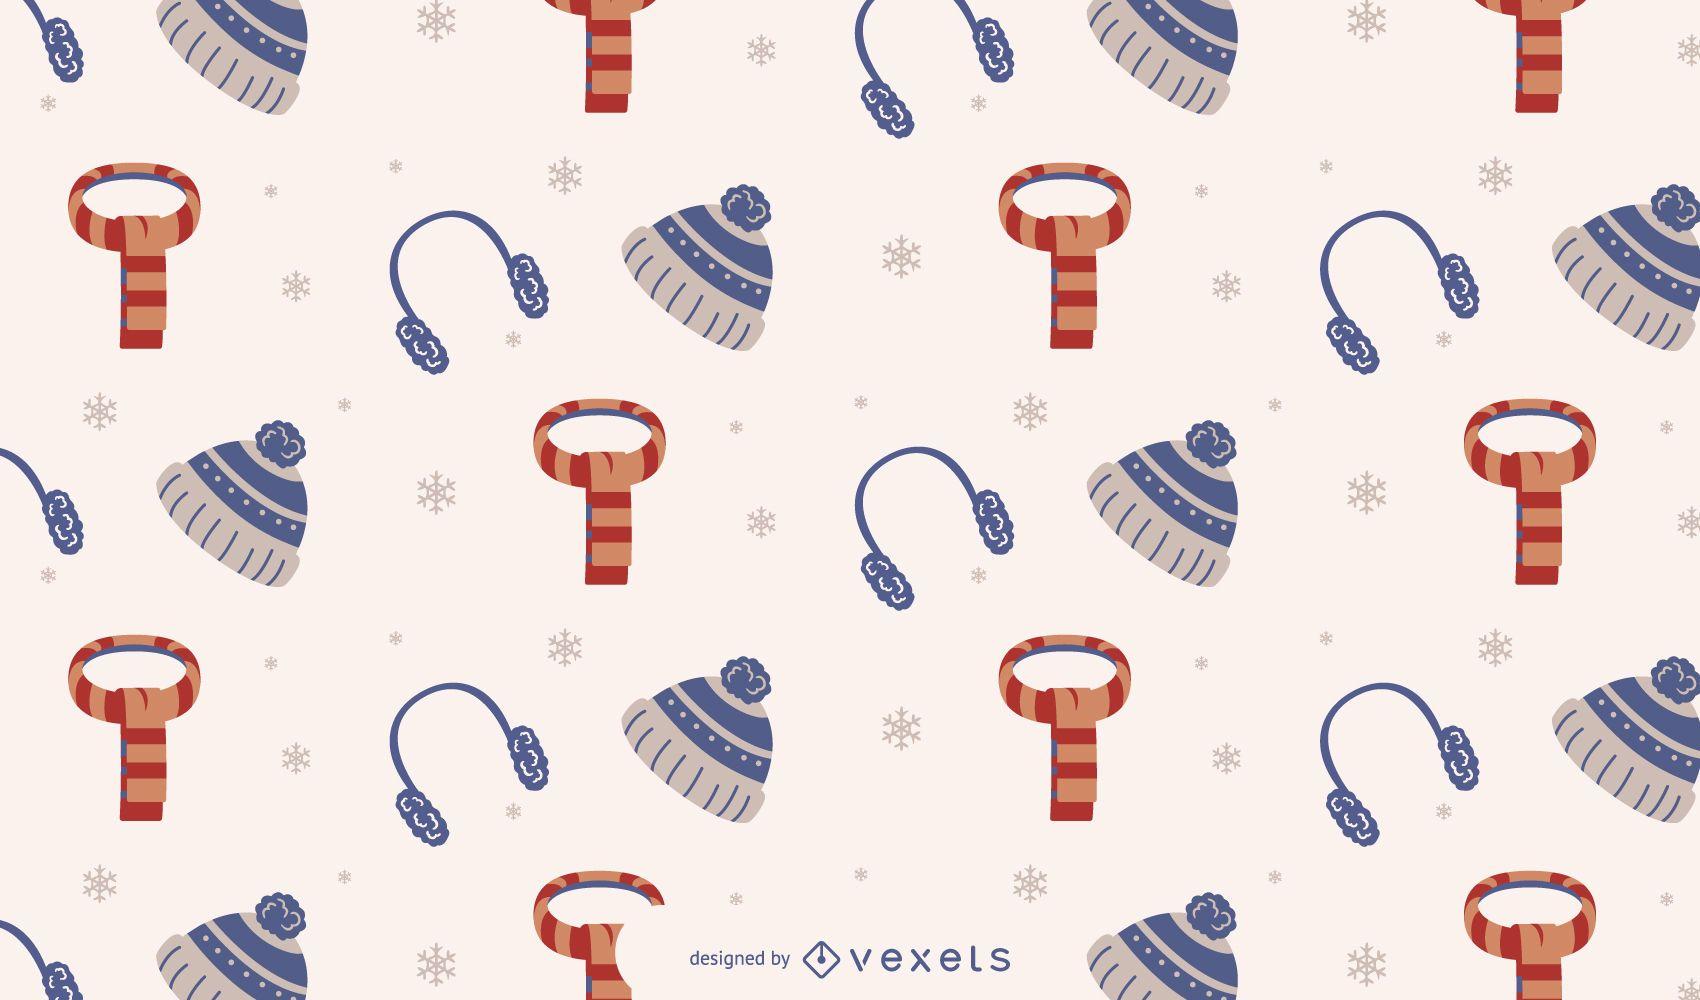 Winter season pattern design